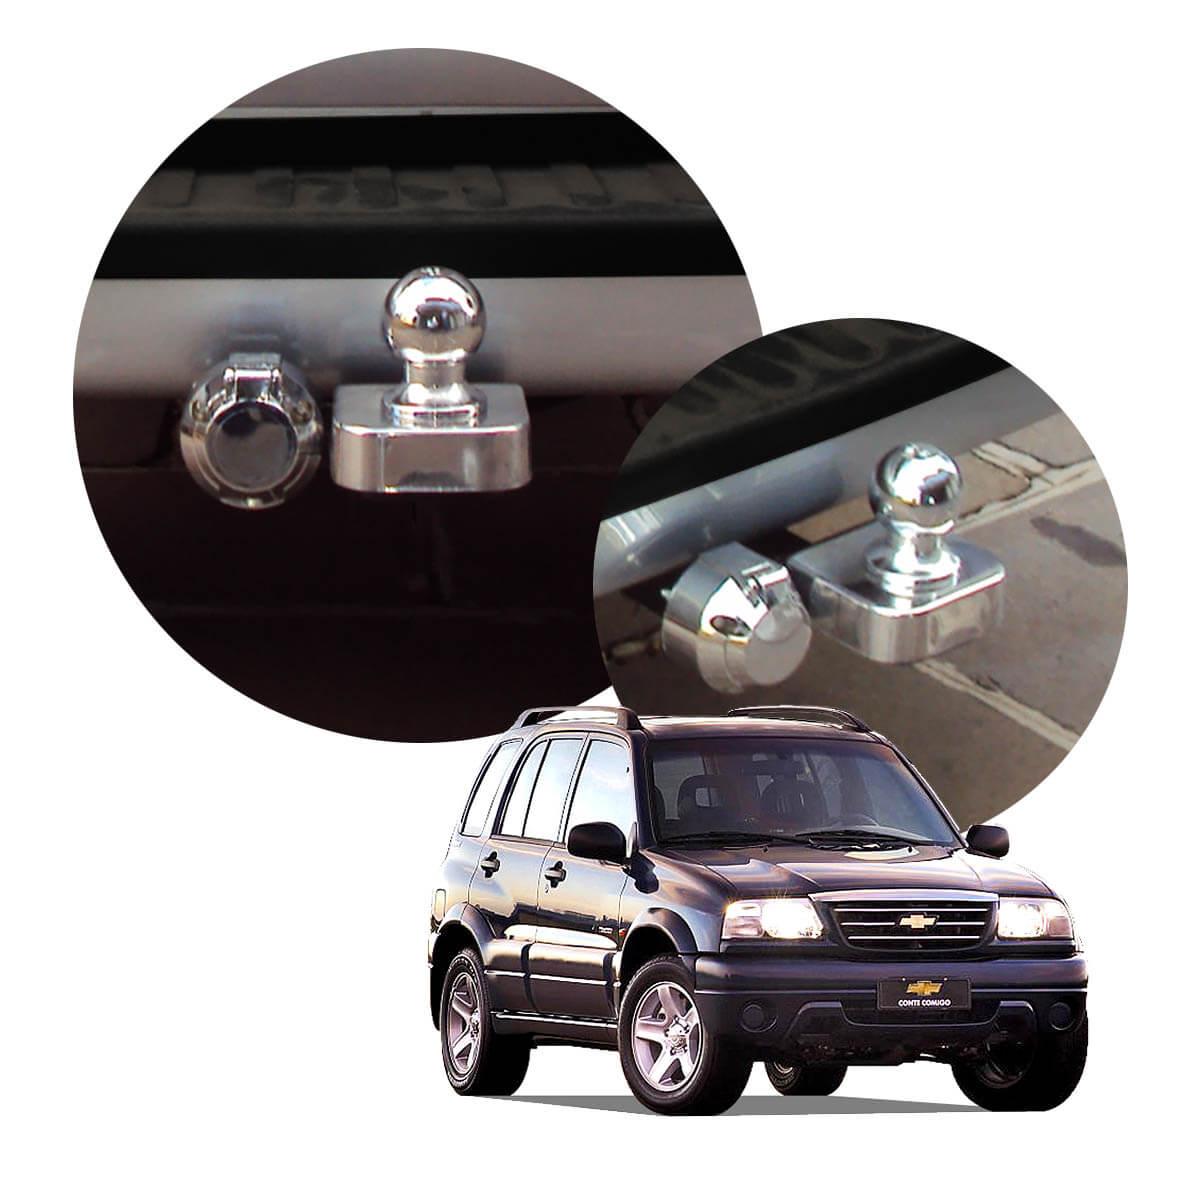 Engate de reboque fixo Tracker 1999 a 2009